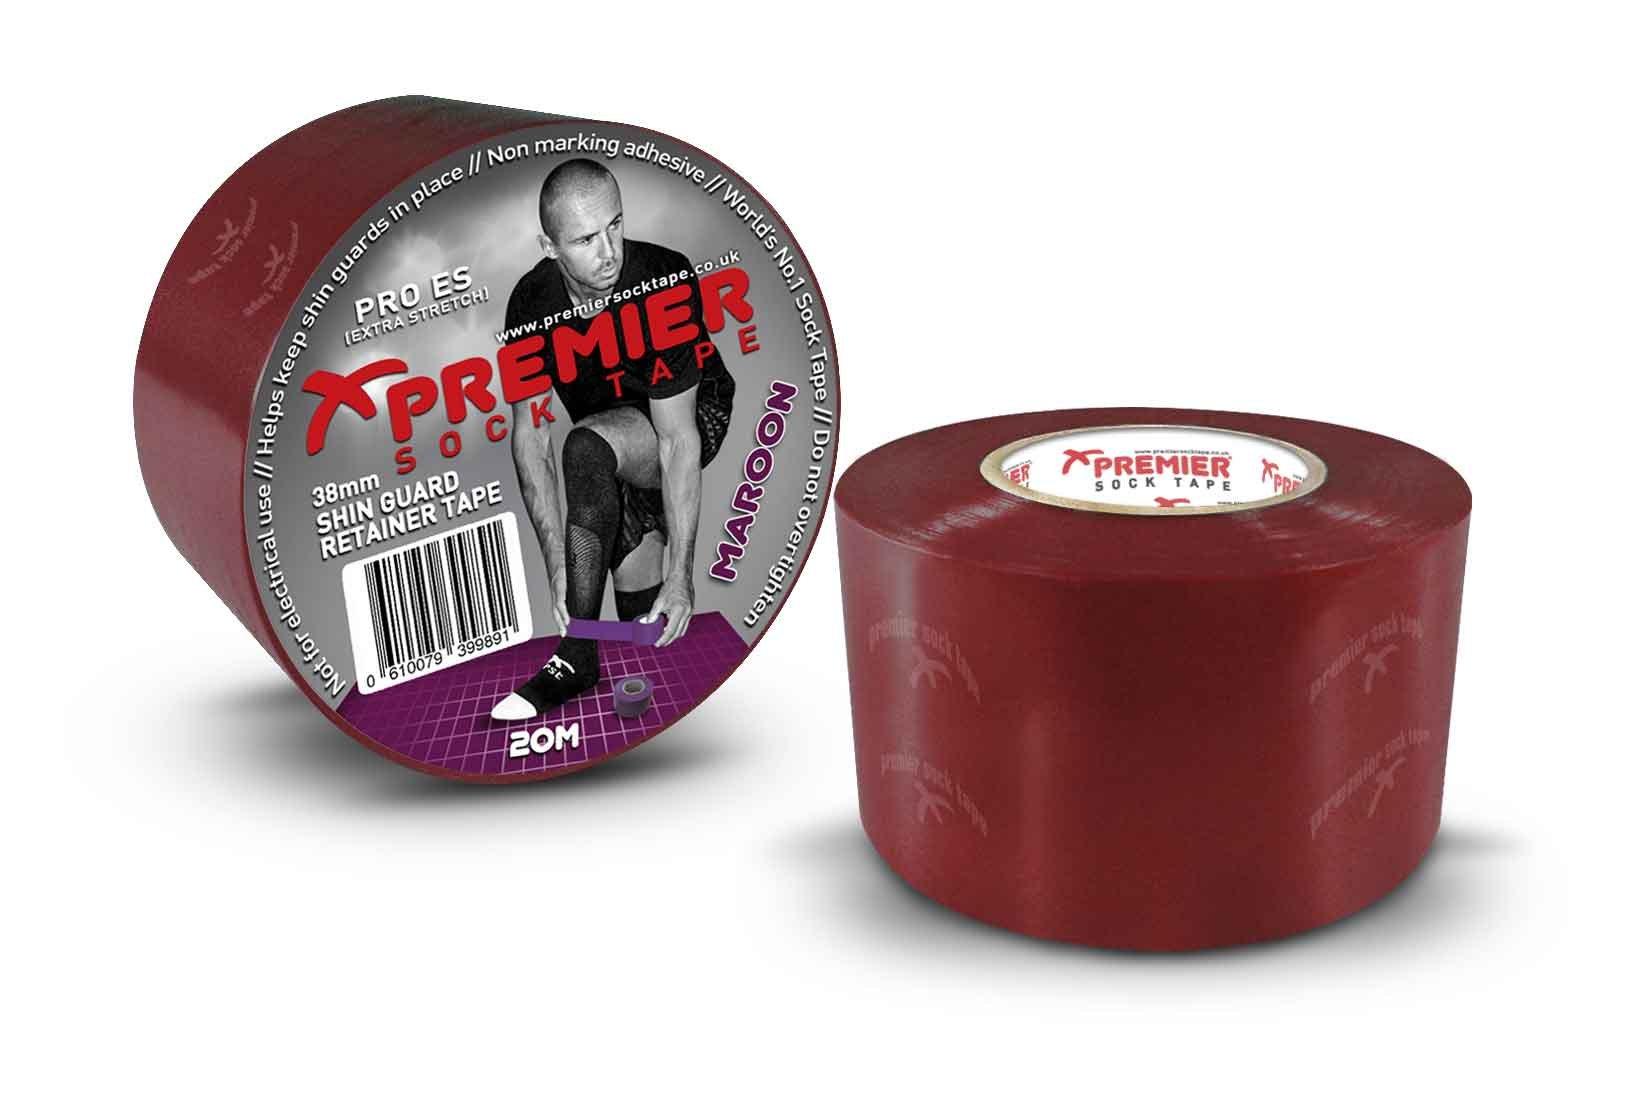 Tejpovací páska Premier Sock Tape SHIN GUARD RETAINER TAPE PRO ES 38mm